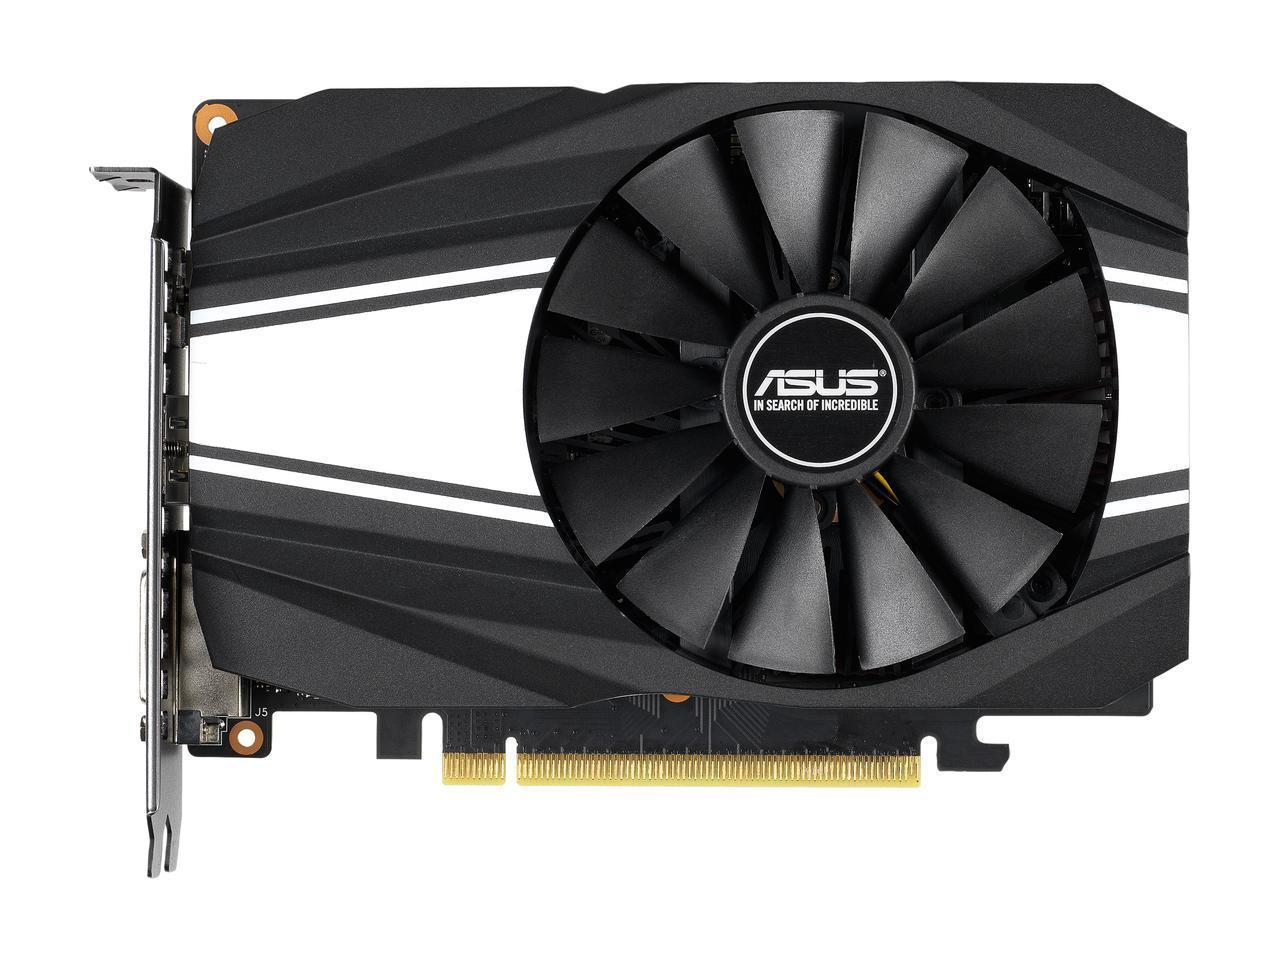 Nvidia GTX 1660 Ti